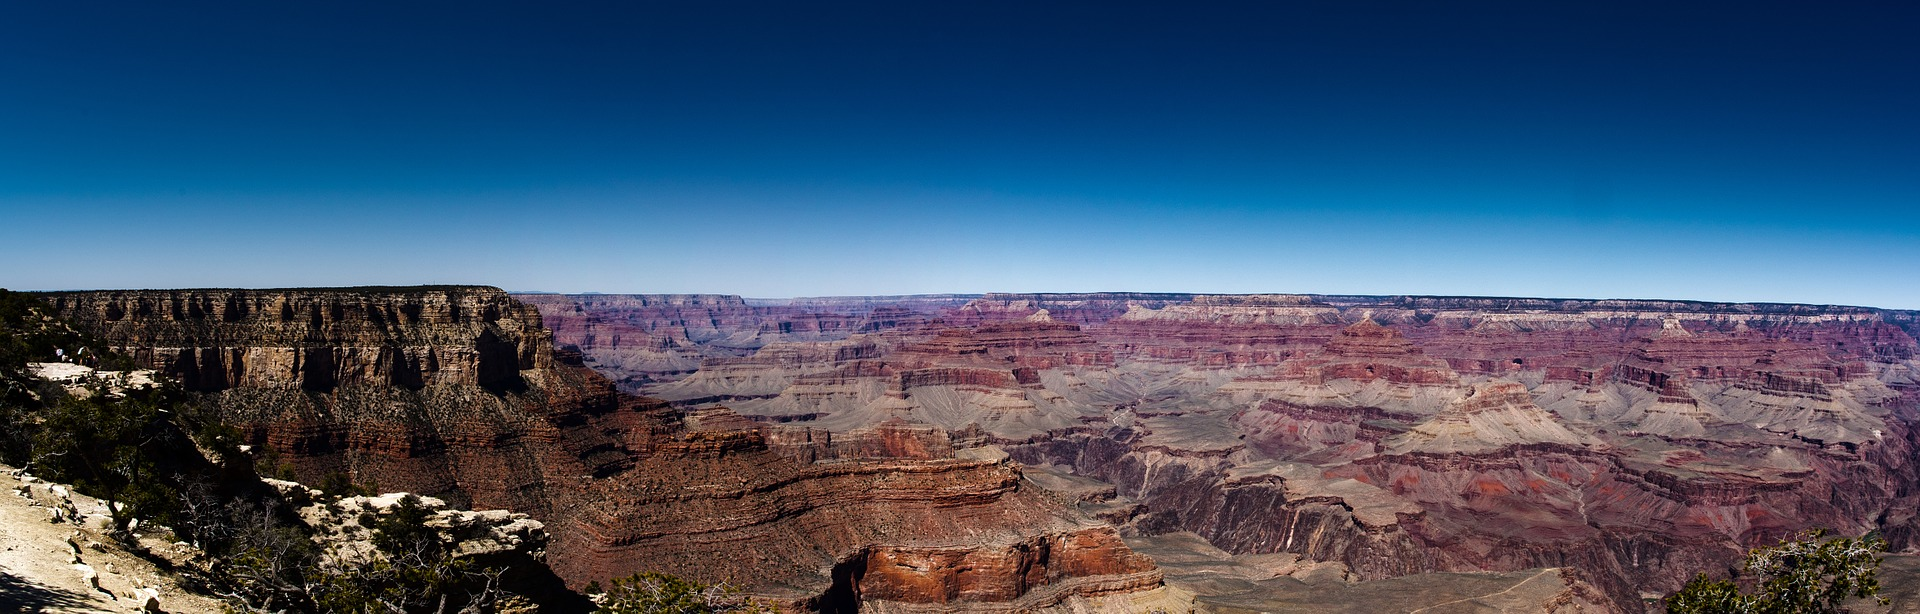 grand-canyon-828762_1920